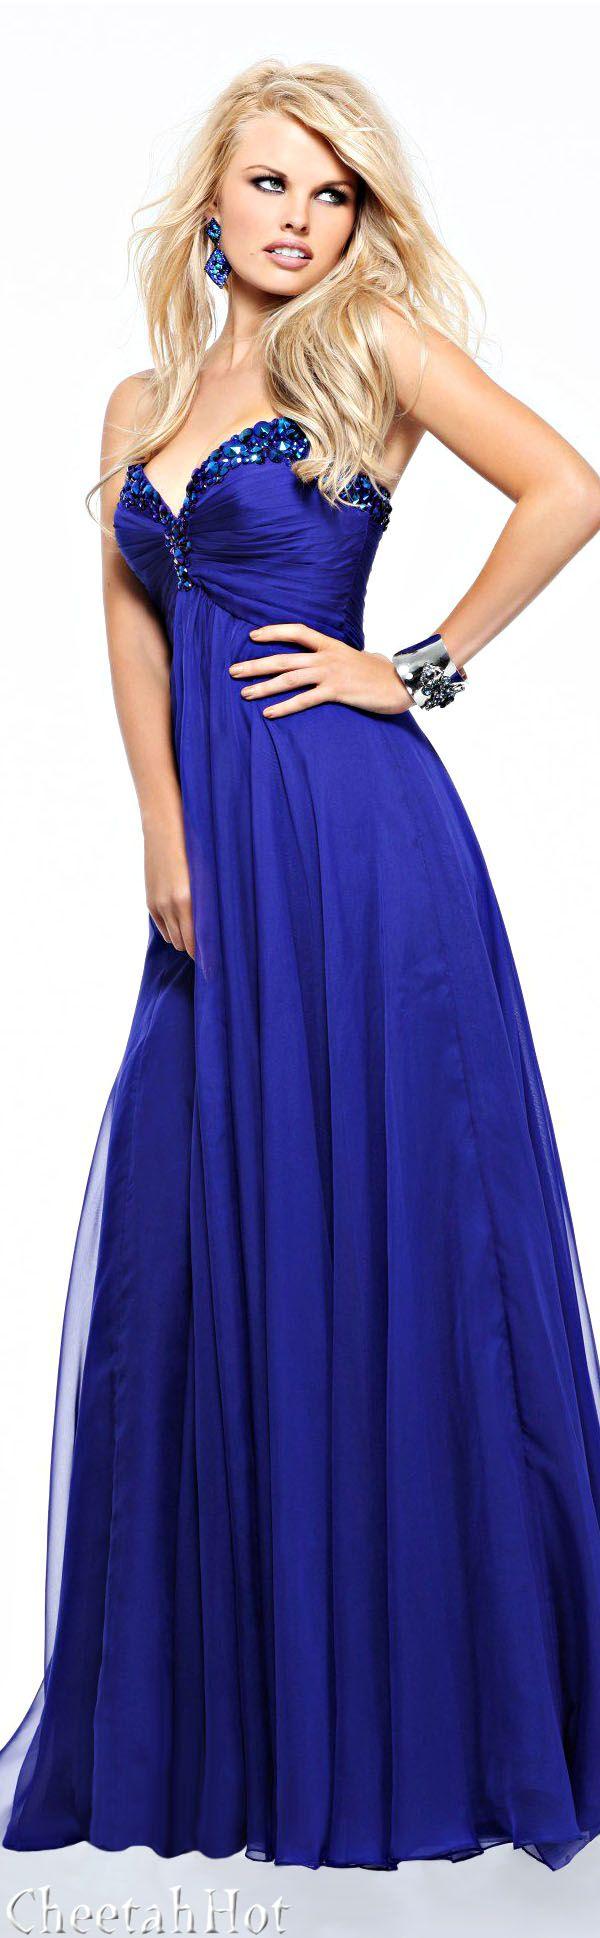 Dorable Vestido De Boda Inspirado Gatsby Colección - Vestido de ...